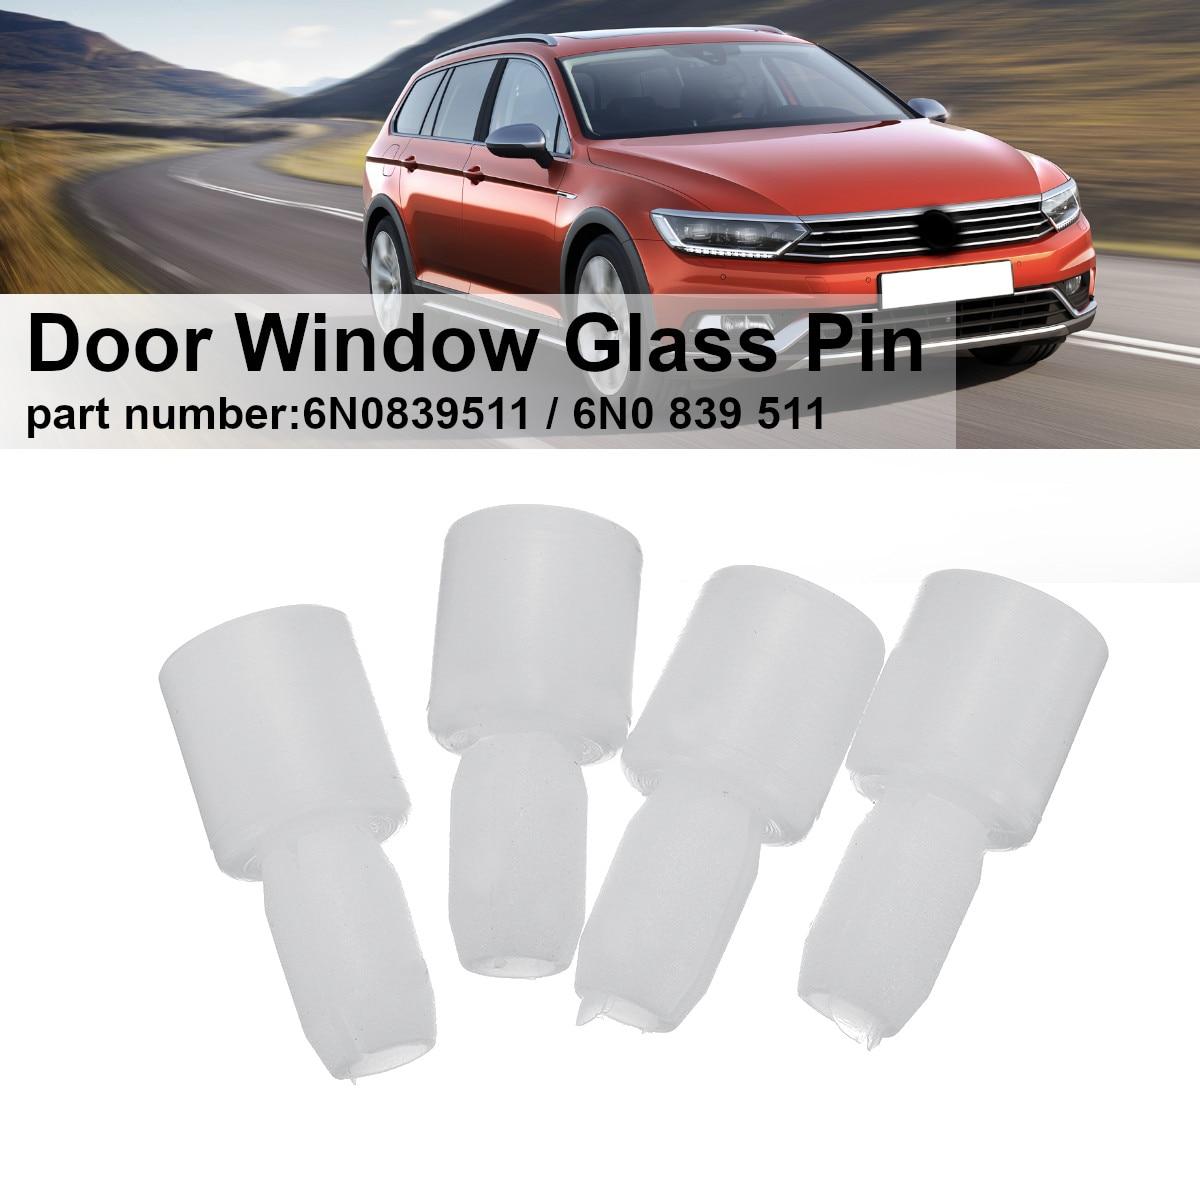 4 Pcs Movable กระจกหน้าต่าง Pin สำหรับ VW Passat B5 B7 Jetta 5 MK6 Bora 4 Golf 4 MK5 tiguan Superb Seat Ibiza Leon A4 6N0839511